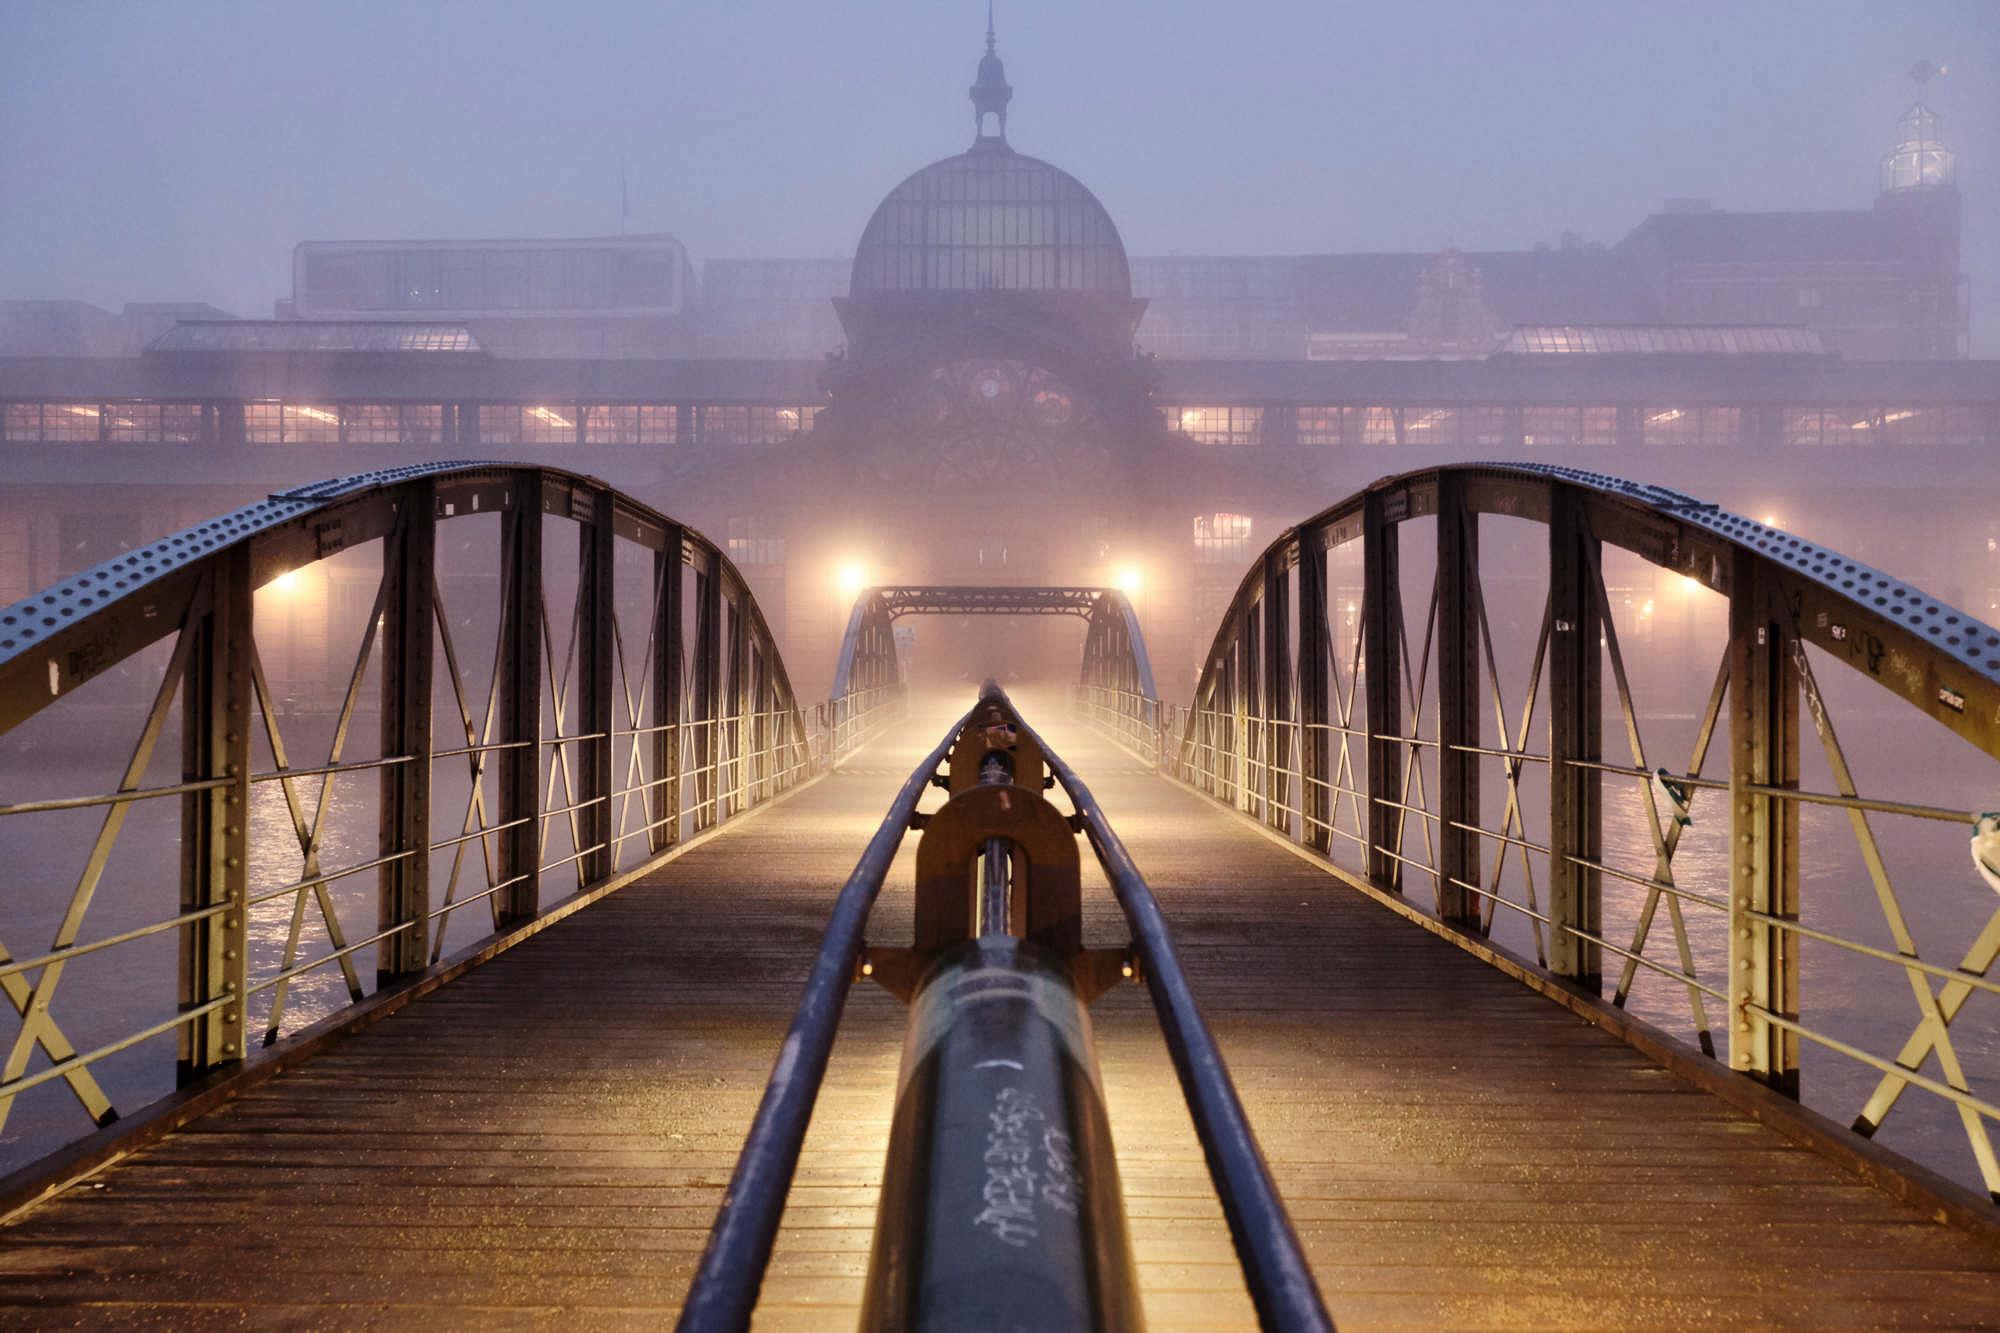 Hamburg Fischmarkt - Nebel, kalte Finger